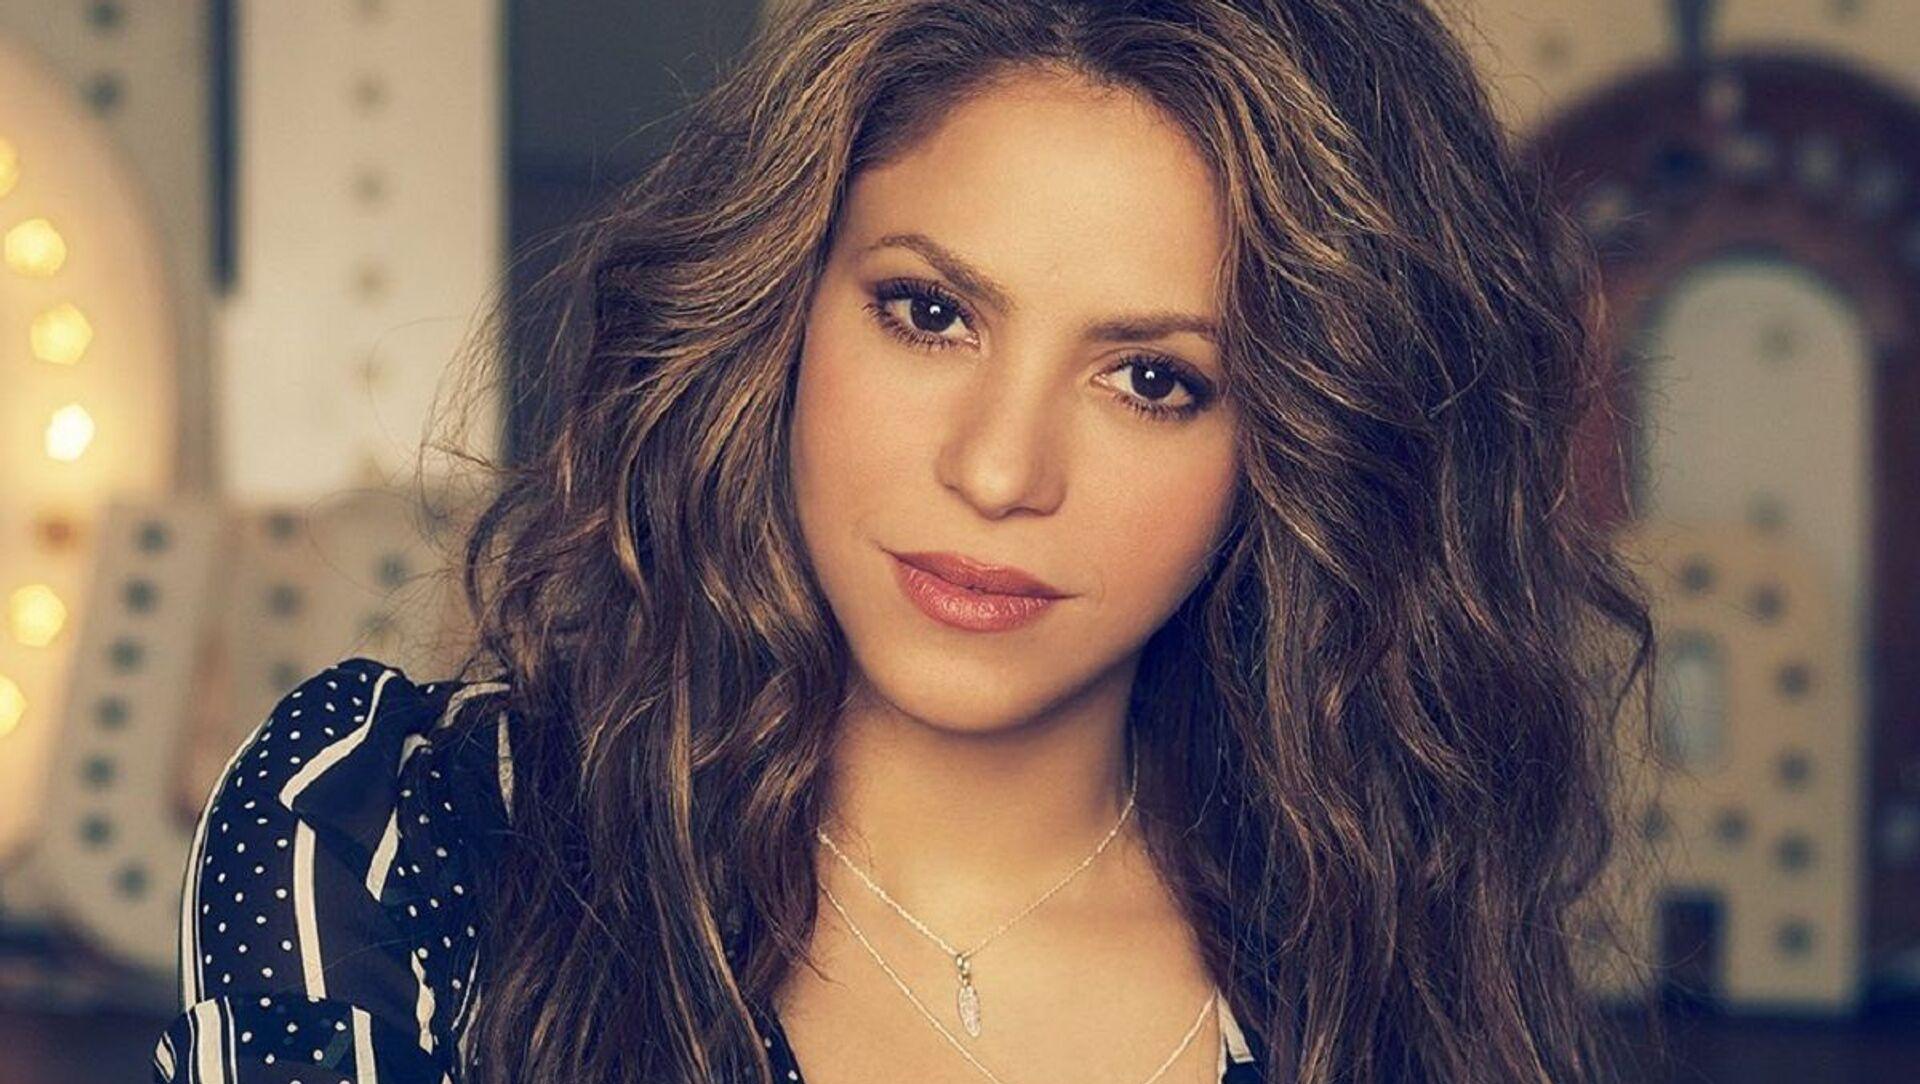 Shakira, cantante colombiana - Sputnik Mundo, 1920, 30.08.2020